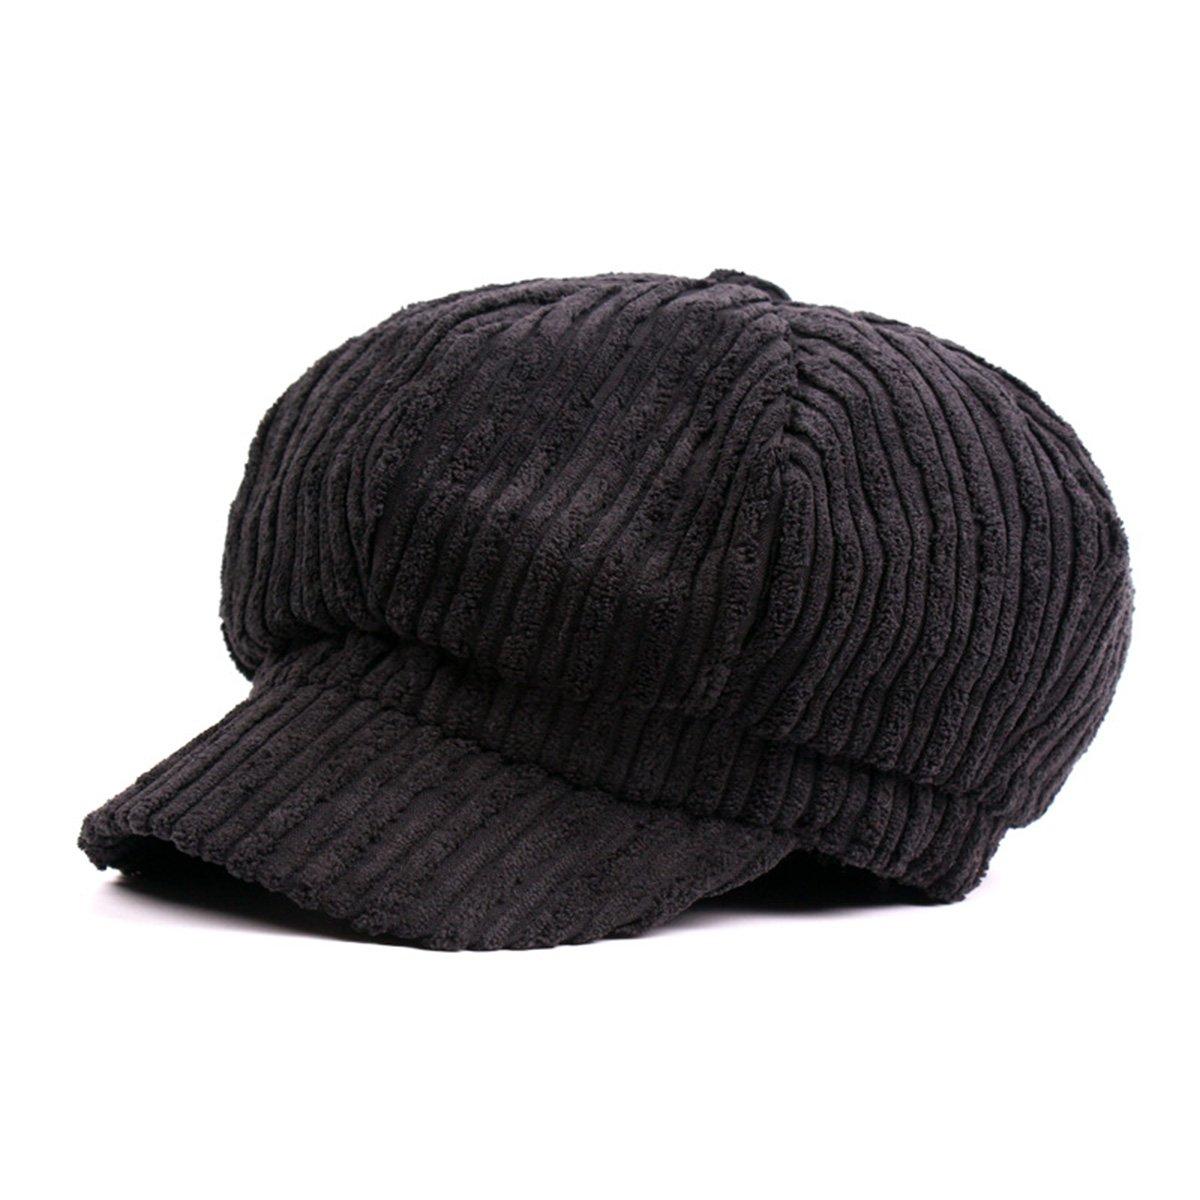 ZLSLZ Womens Corduroy Striped Octagonal Ivy Newsboy Cabbie Gatsby Painter Hats Caps For Women Black